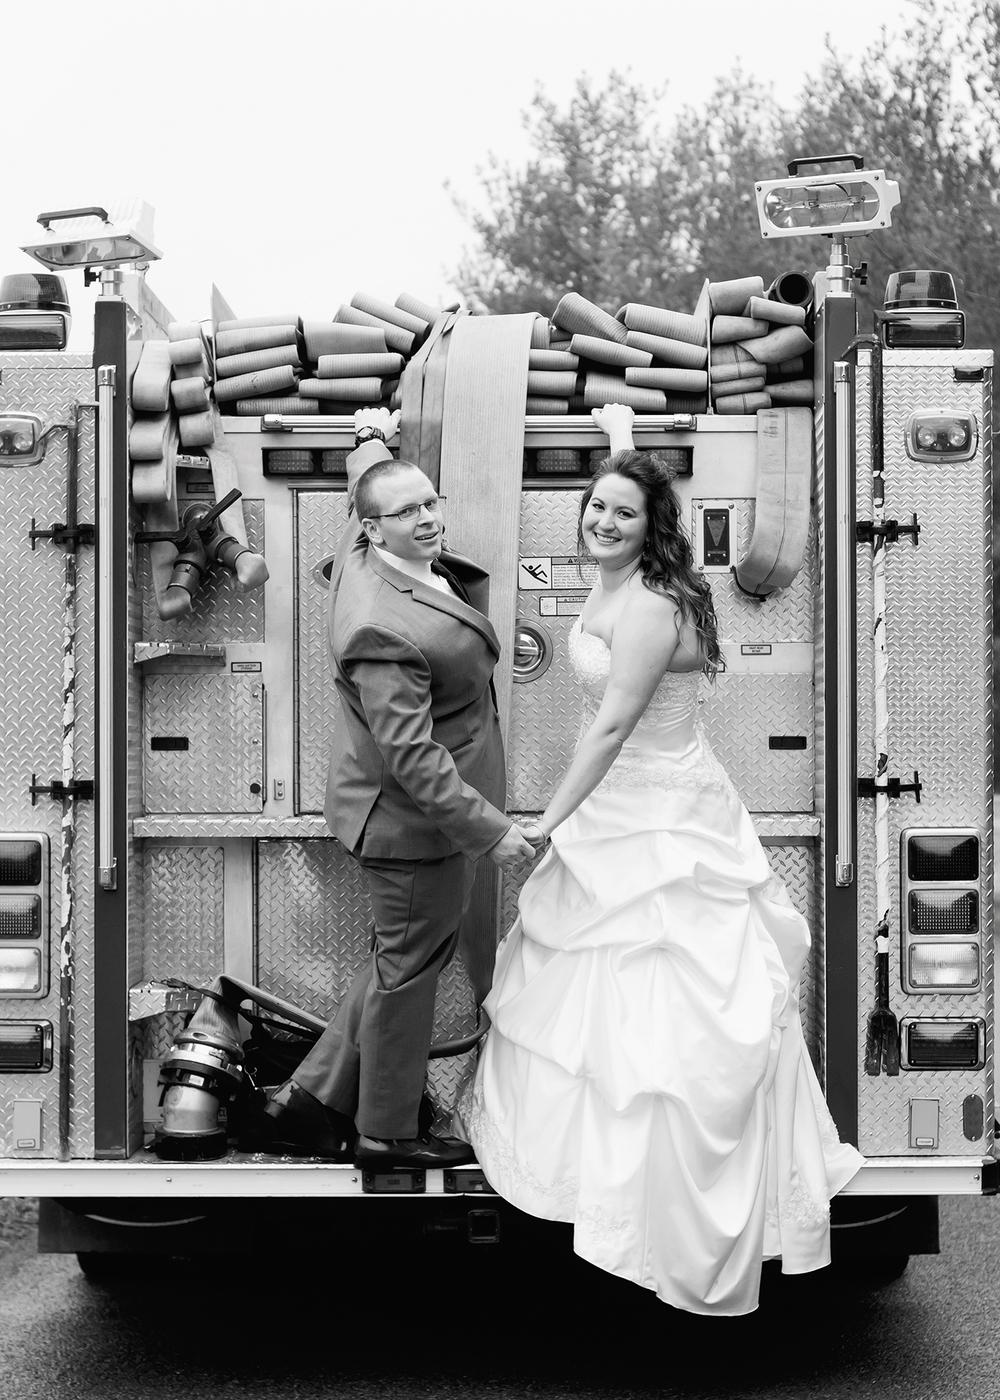 Firefighter Wedding Newlywed Pose